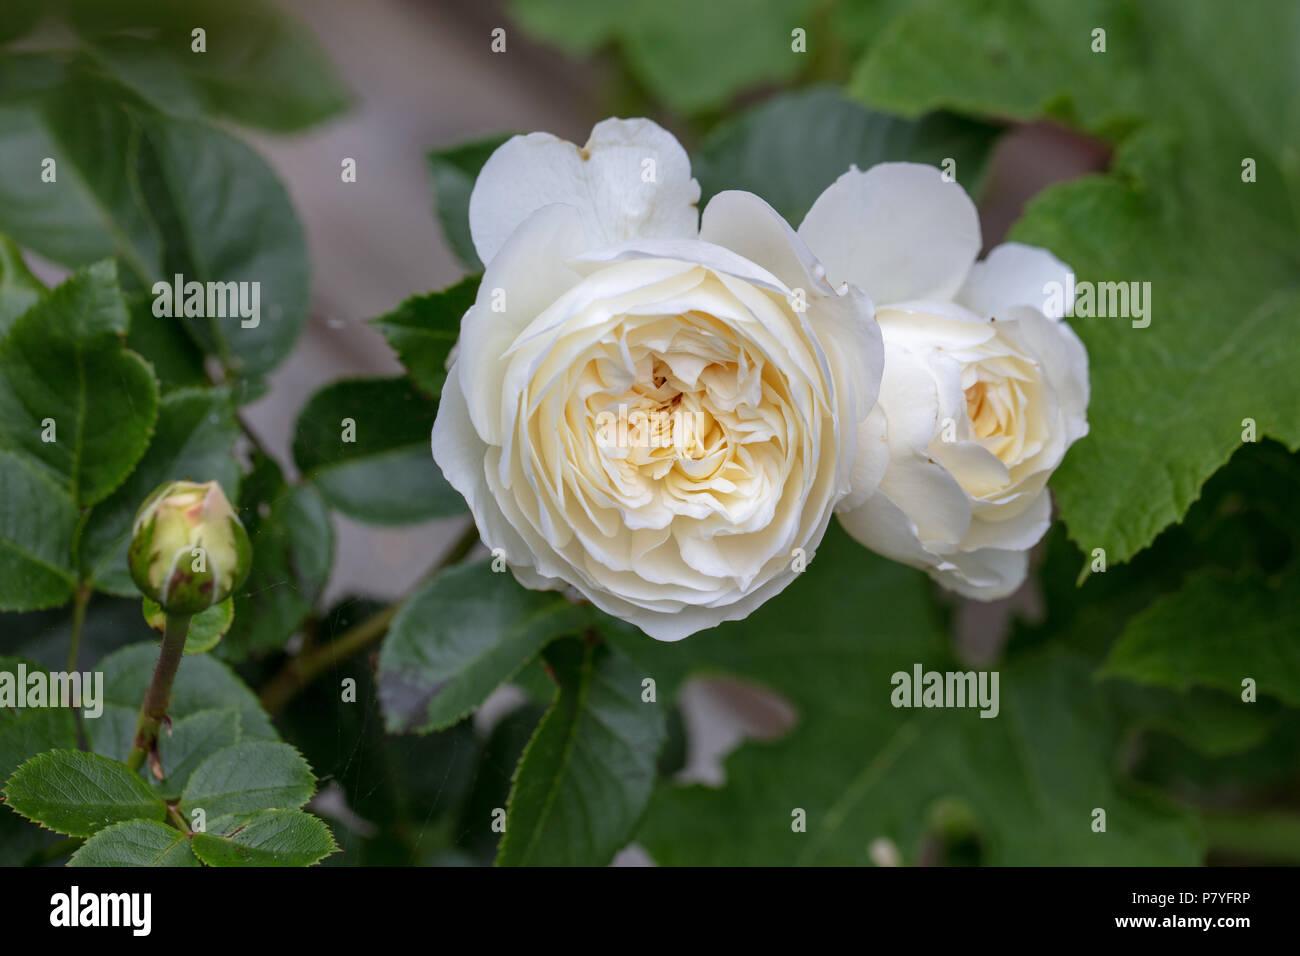 'Tranquillity, Ausnoble' English Rose, Engelsk ros (Rosa) - Stock Image